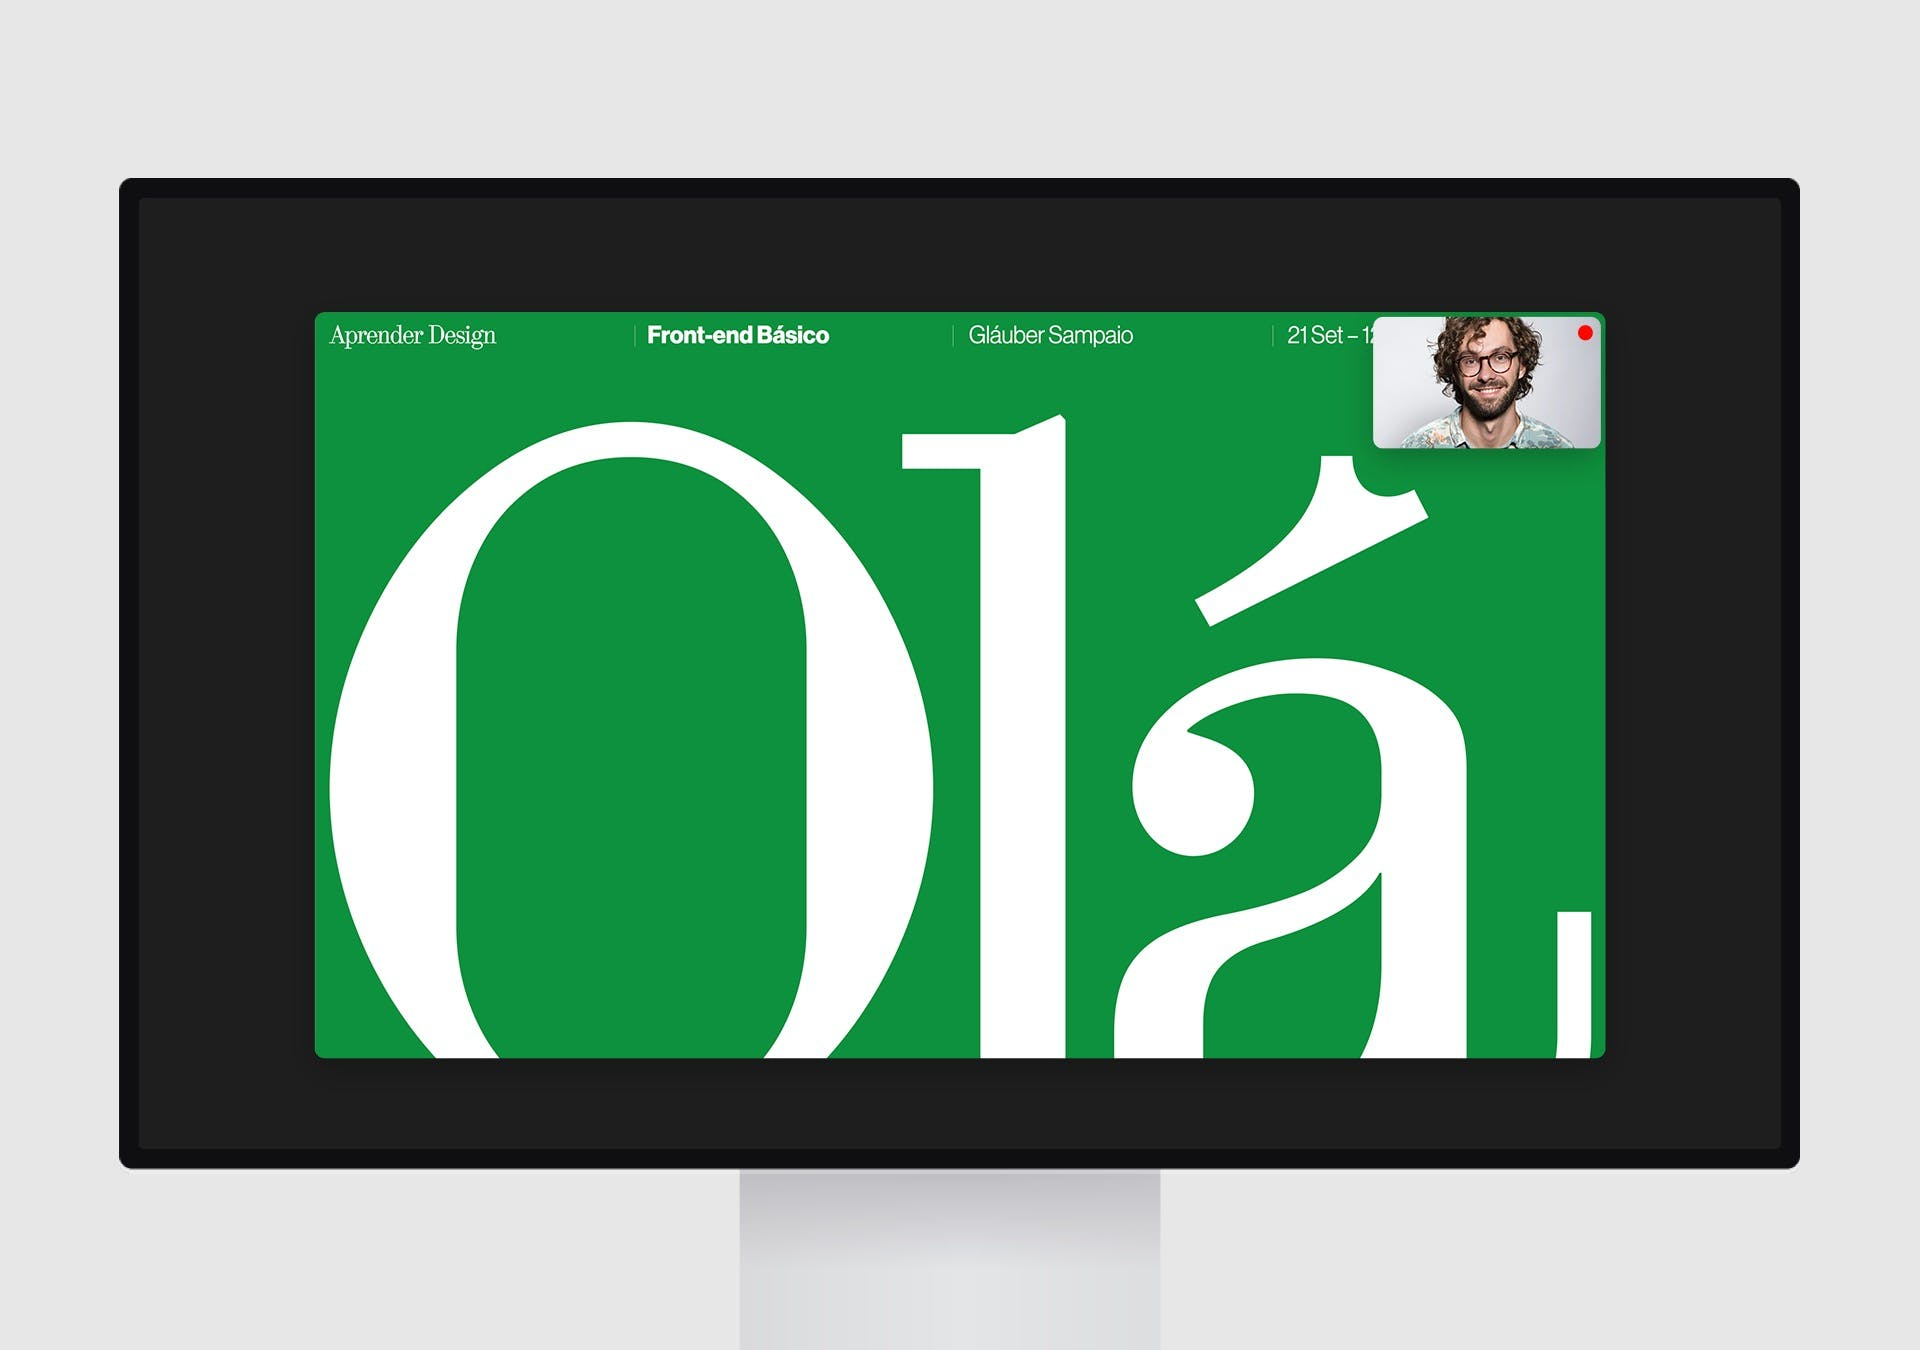 glauber-sampaio-aprender-design-12.jpeg